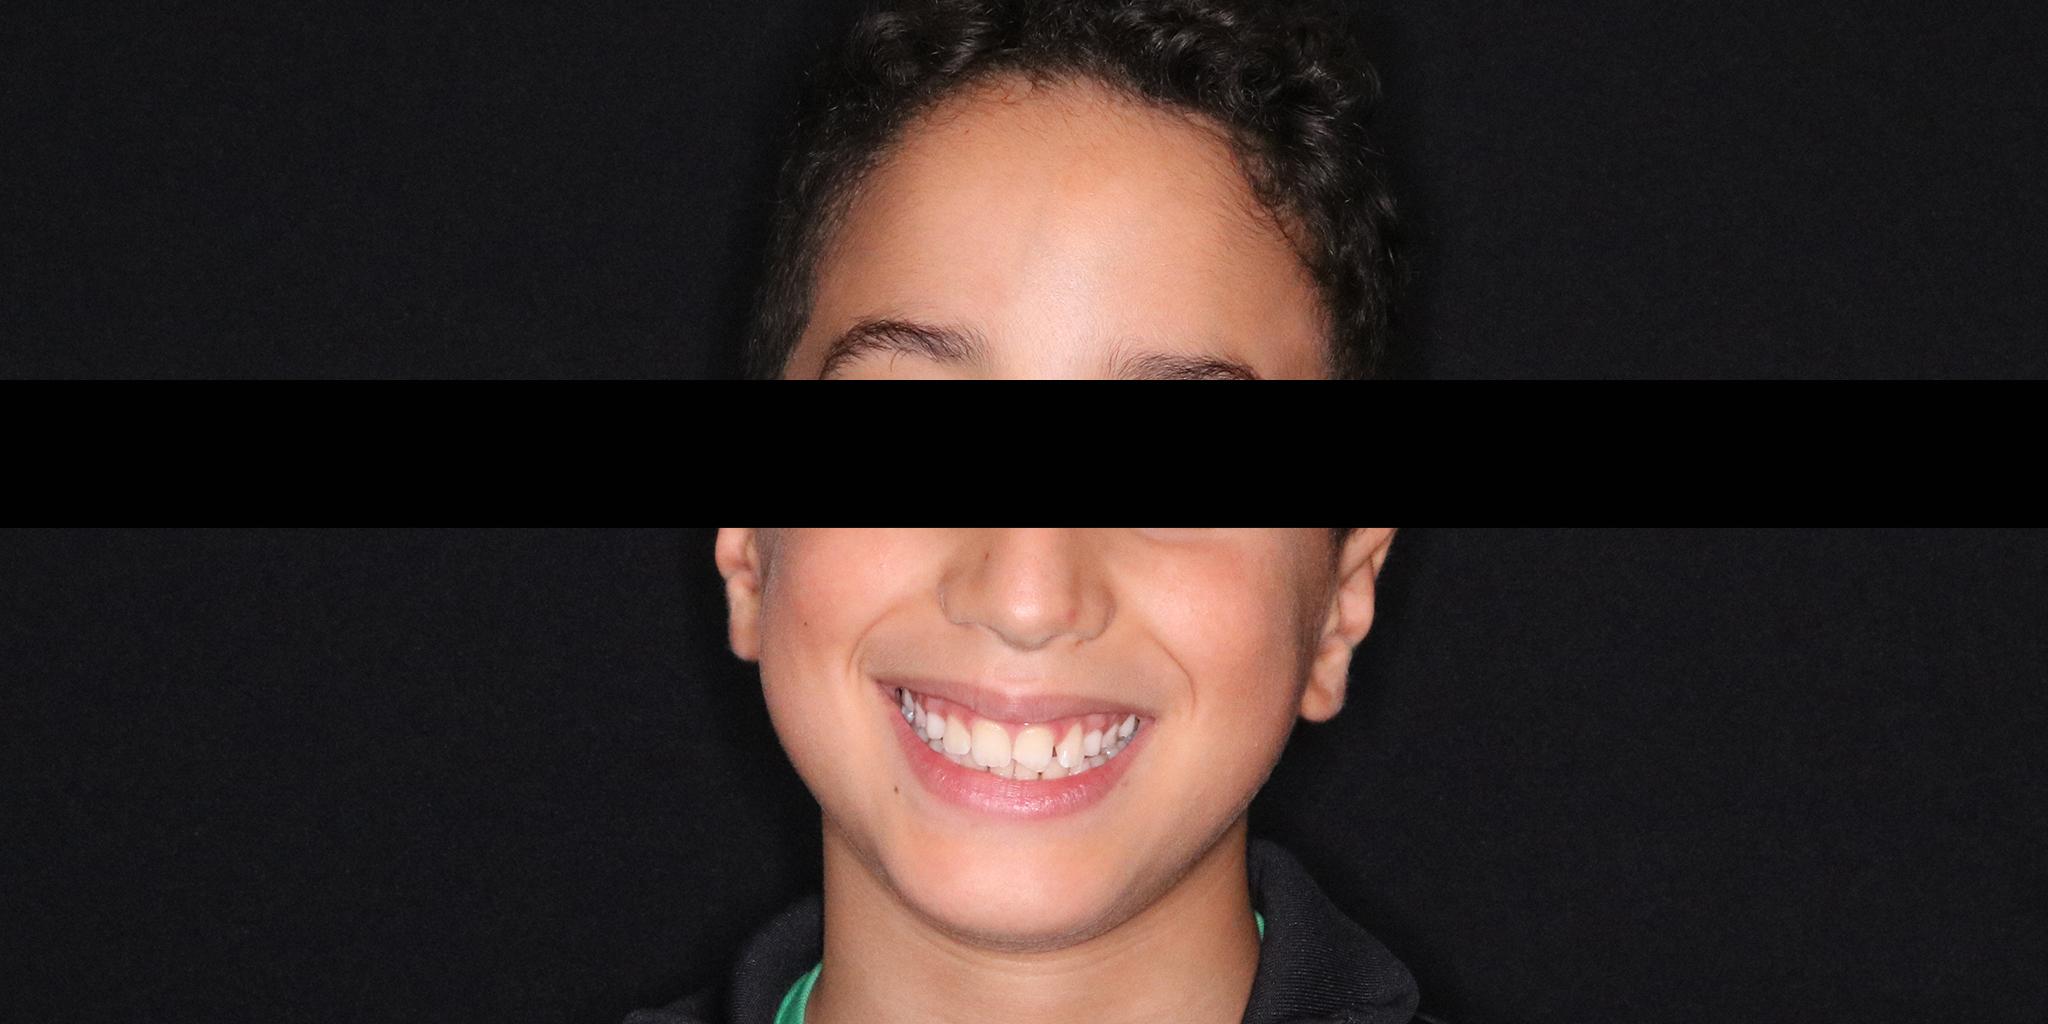 After-Ortodontia removível